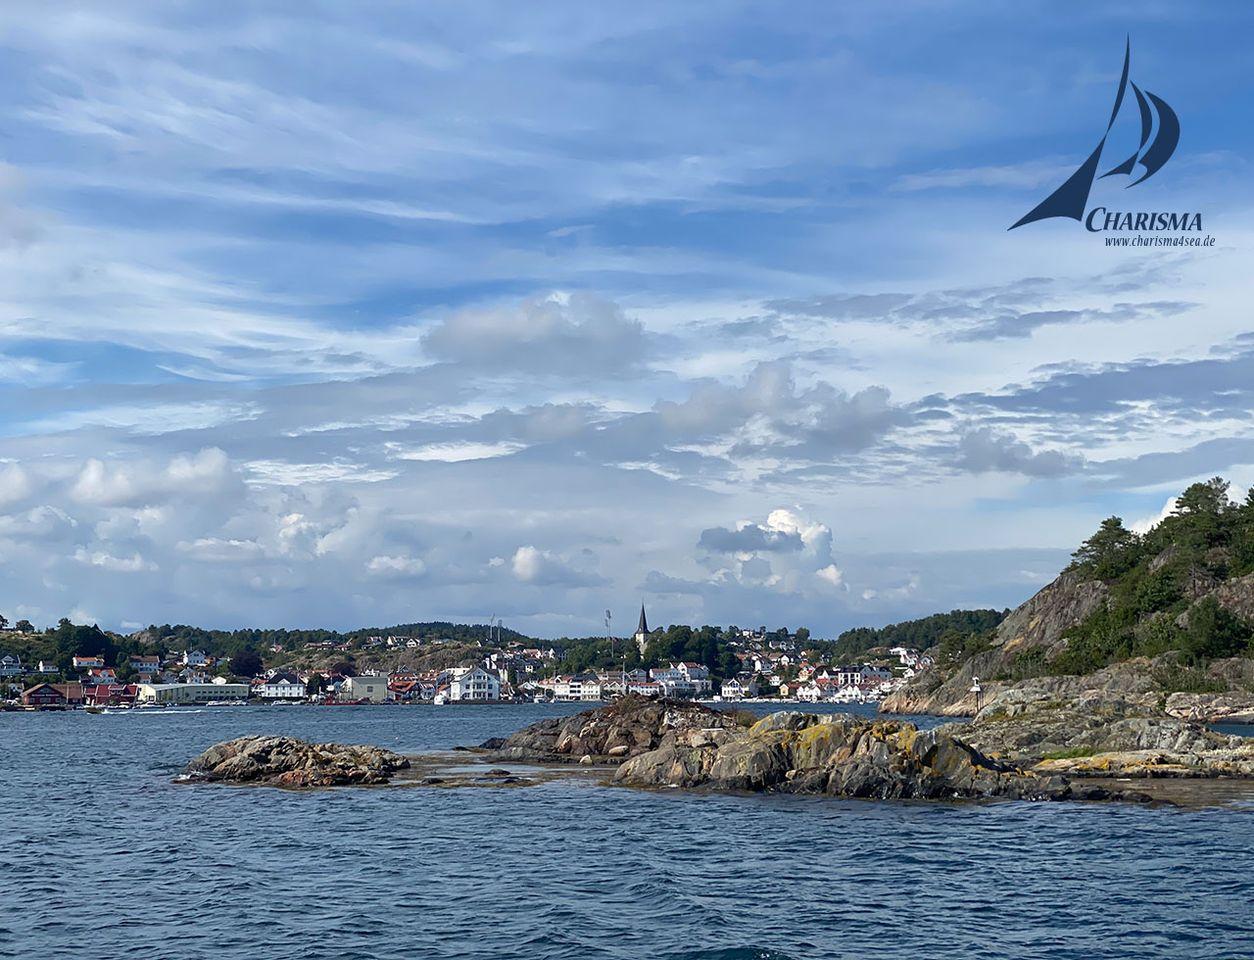 Kurs Grimstad